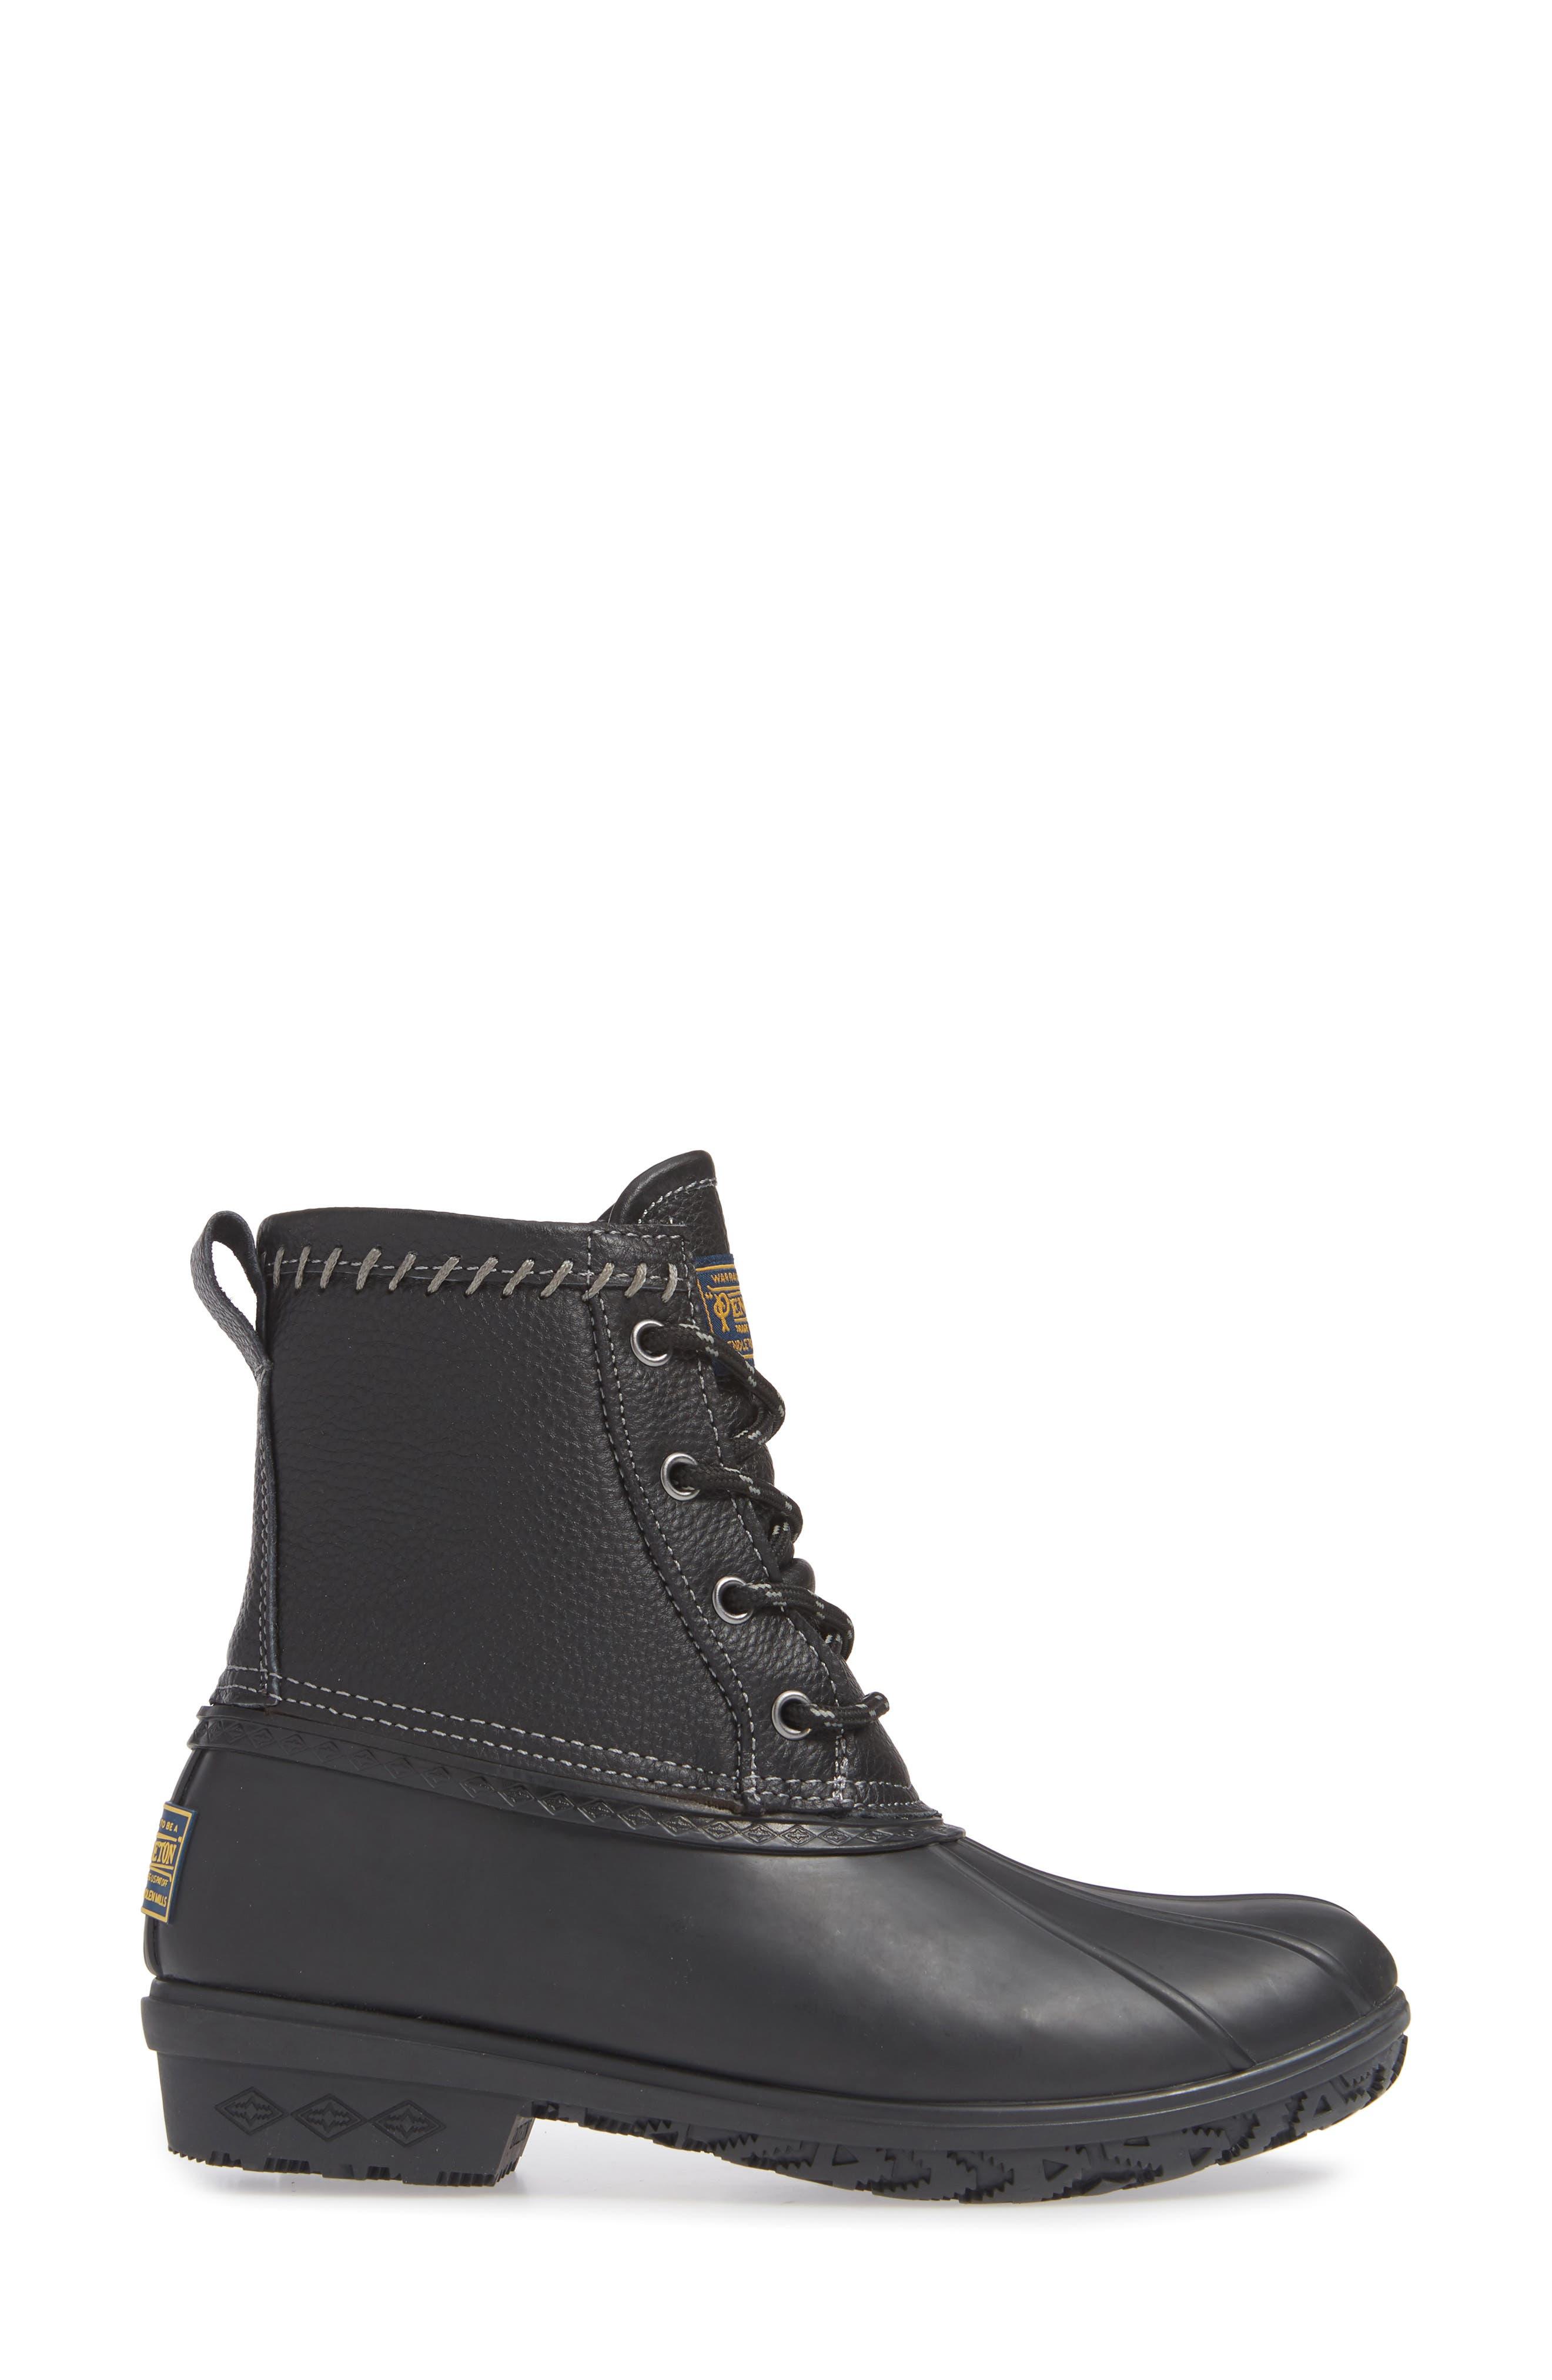 PENDLETON, Waterproof Duck Boot, Alternate thumbnail 3, color, BLACK RUBBER